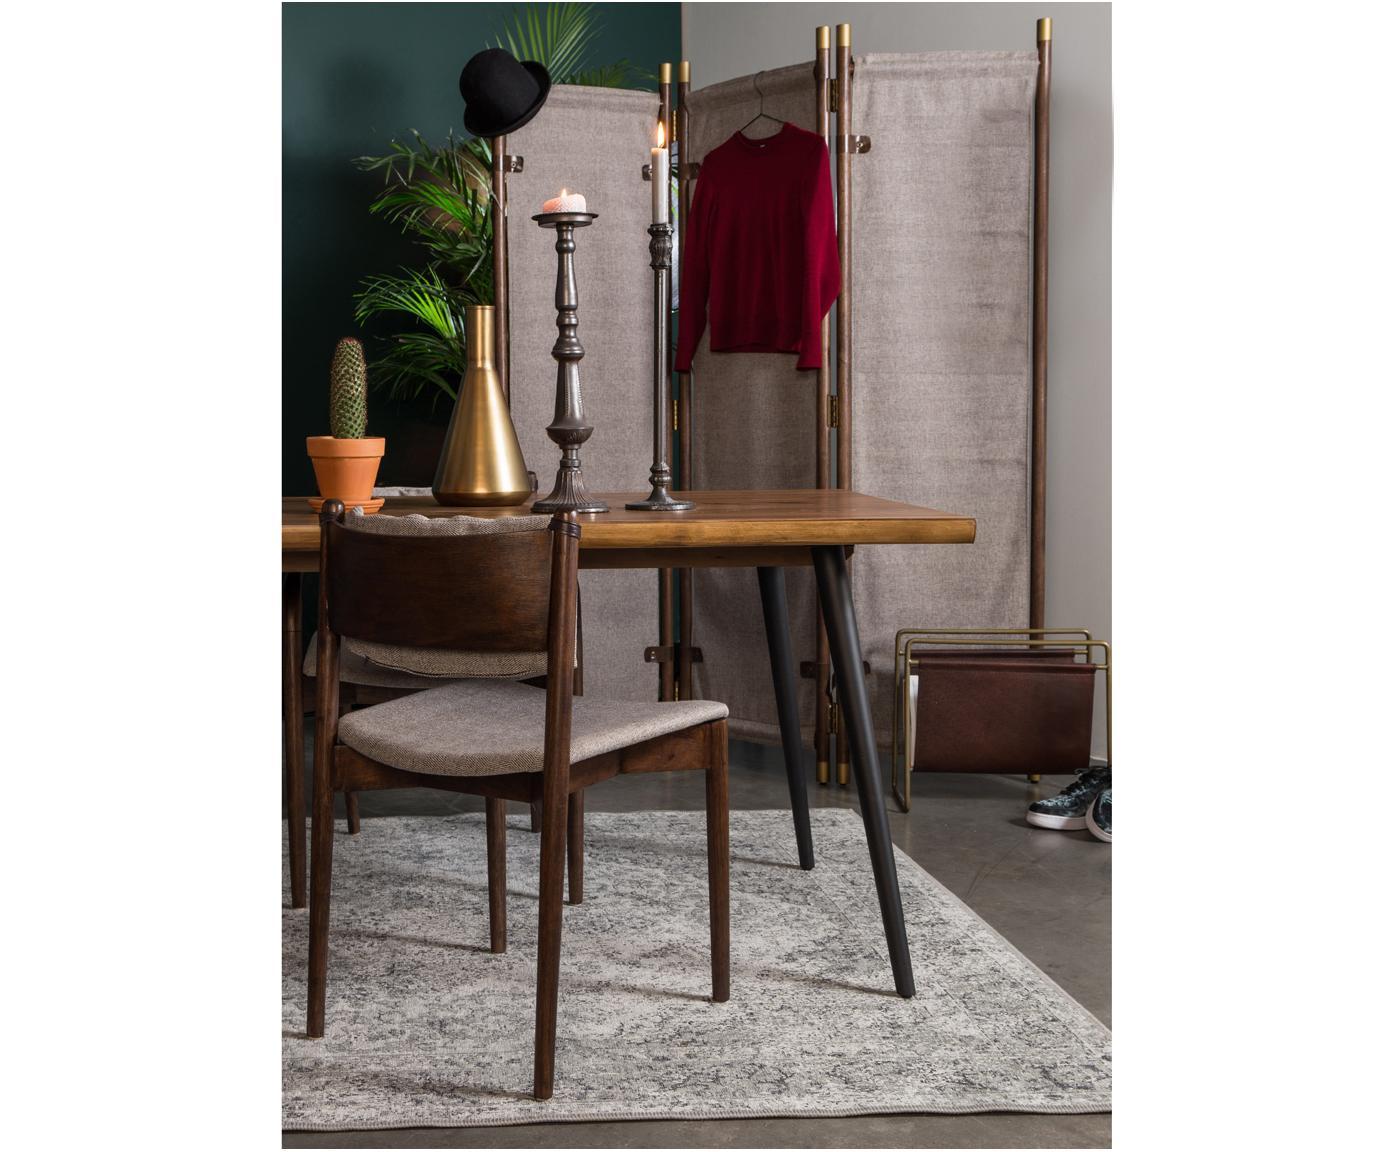 Gestoffeerde stoelen Torrance, 2 stuks, Bekleding: polyester, Frame: massief rubberhout, licht, Beige, acaciahoutkleurig, 46 x 53 cm